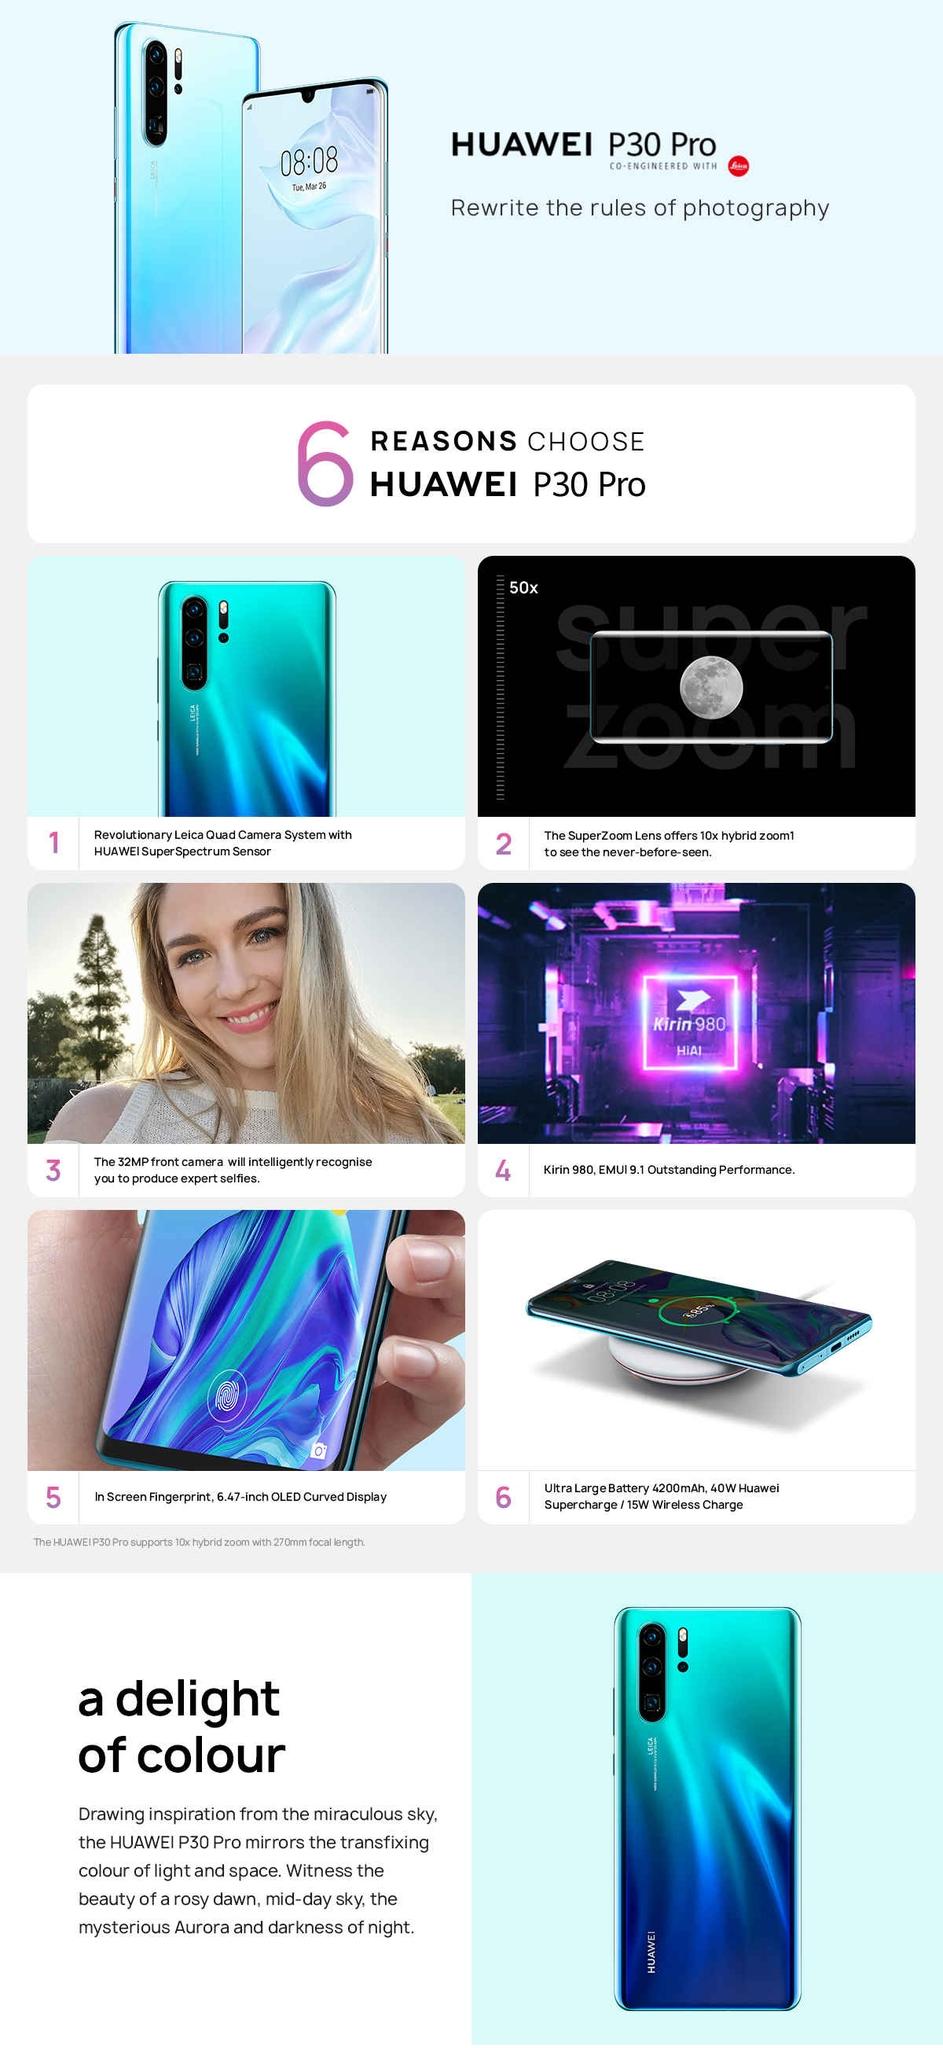 P30 Pro 6 47-Inch (8GB RAM + 256GB ROM) Android 9 0,40MP + 20MP + 8MP, Dual  SIM - Aurora